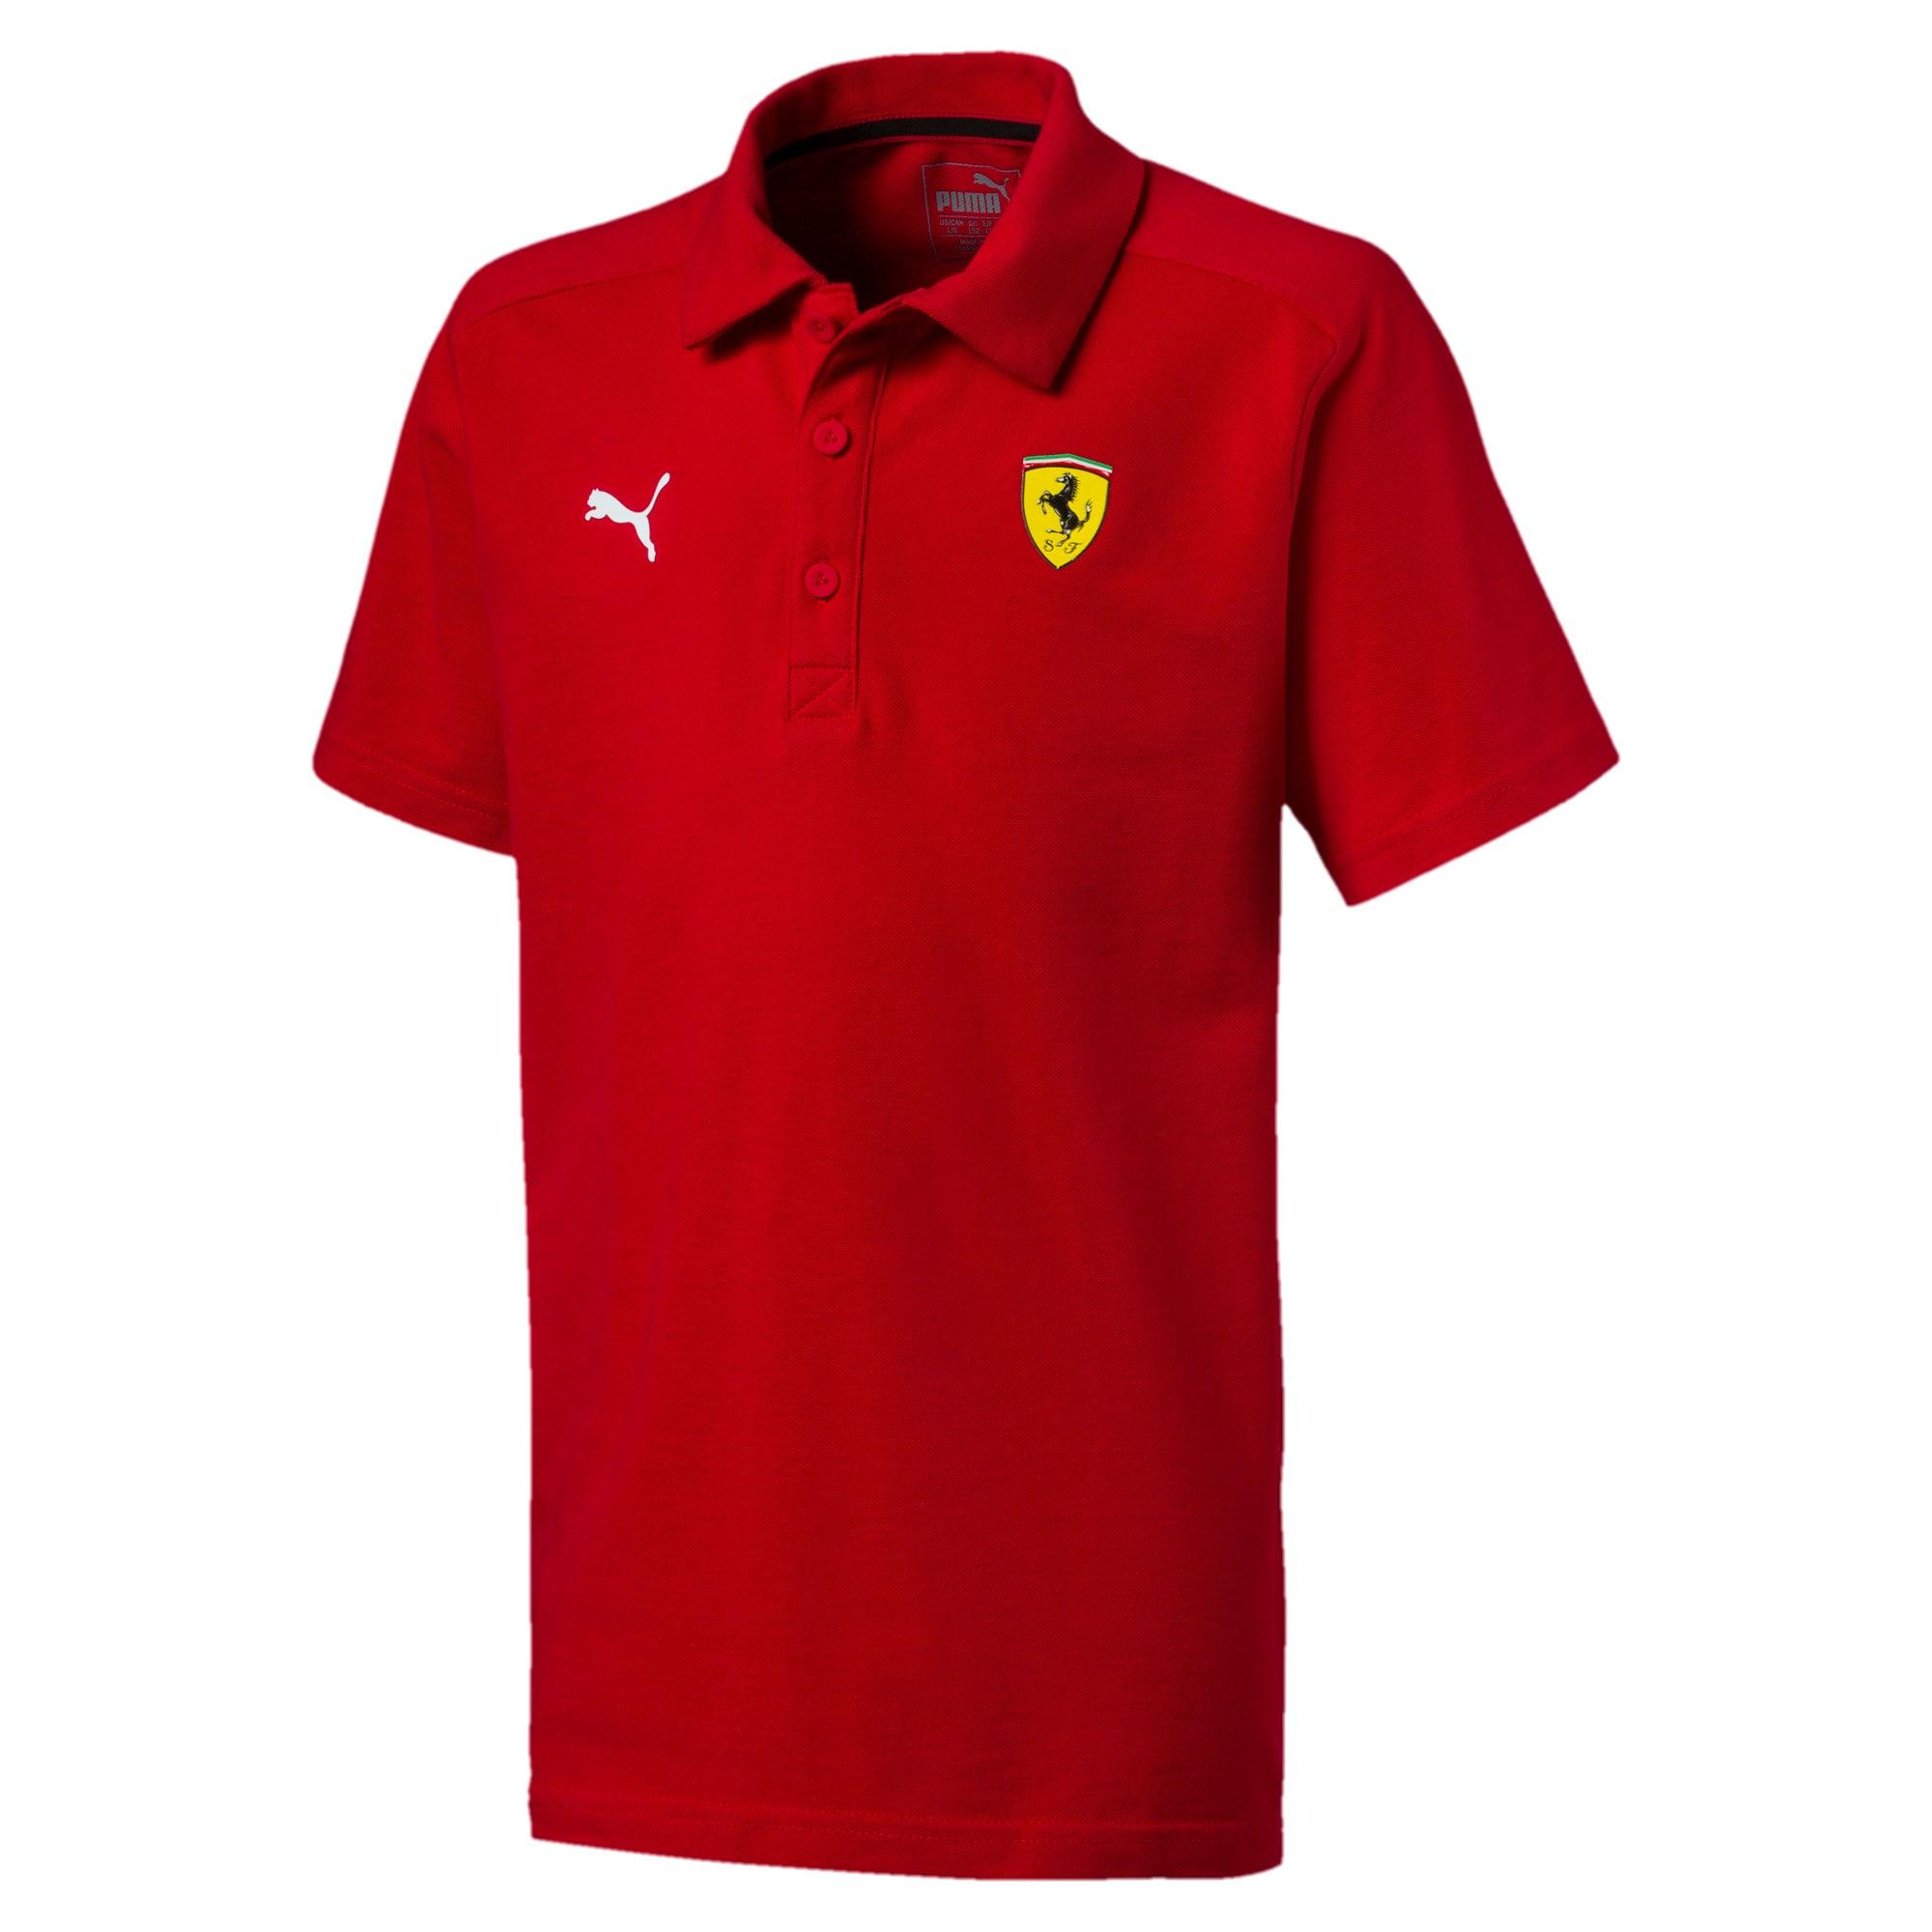 Thumbnail 1 of Scuderia Ferrari Boys' Polo JR, Rosso Corsa, medium